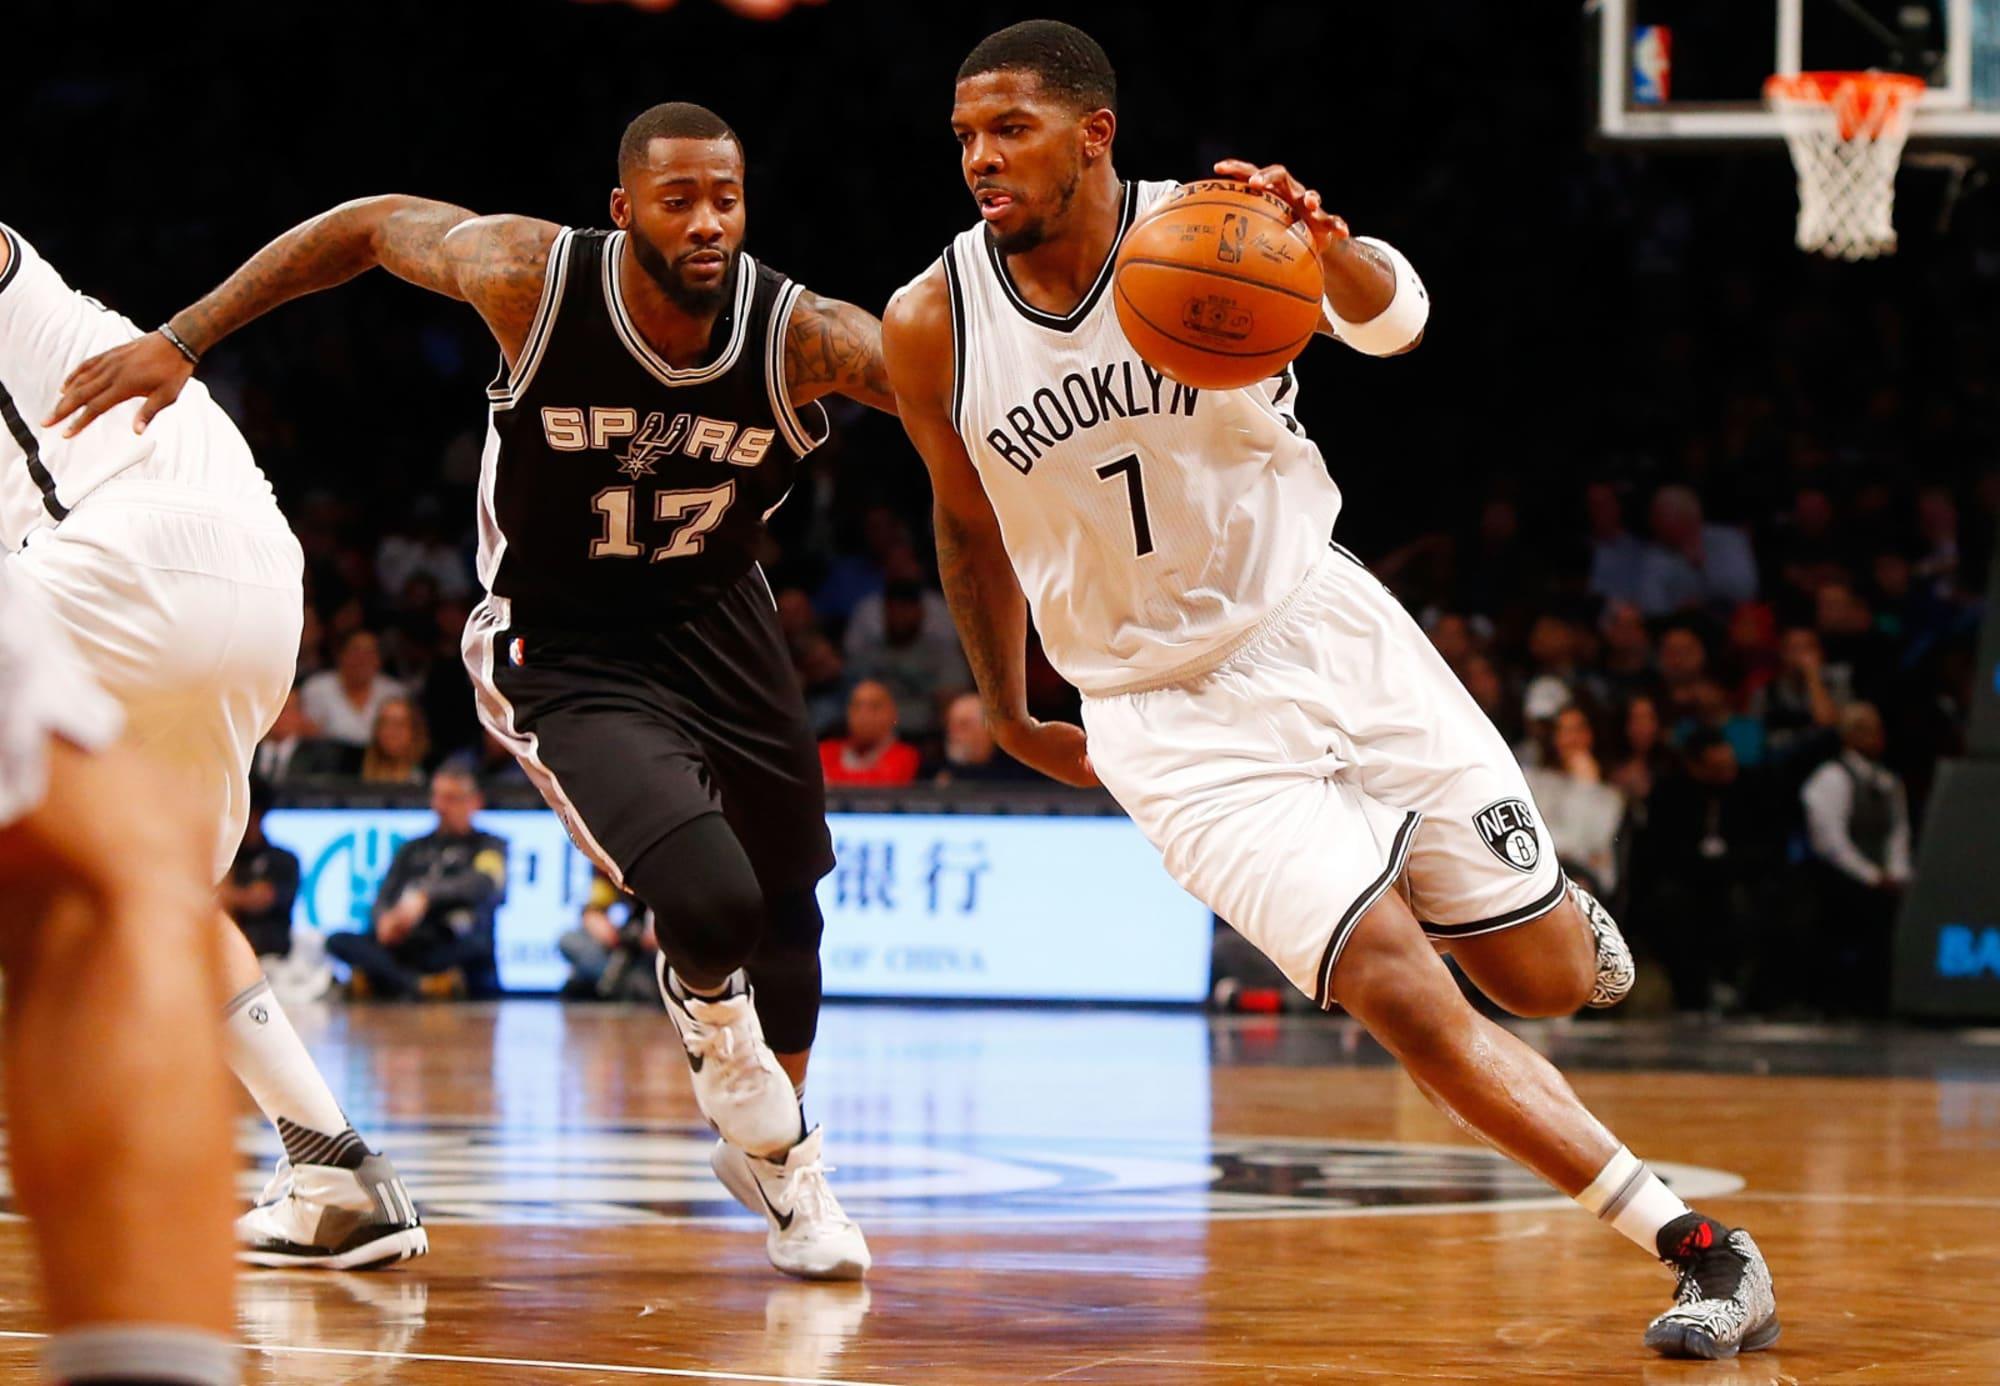 Brooklyn Nets: Joe Johnson comeback better not impact BK's playoff run